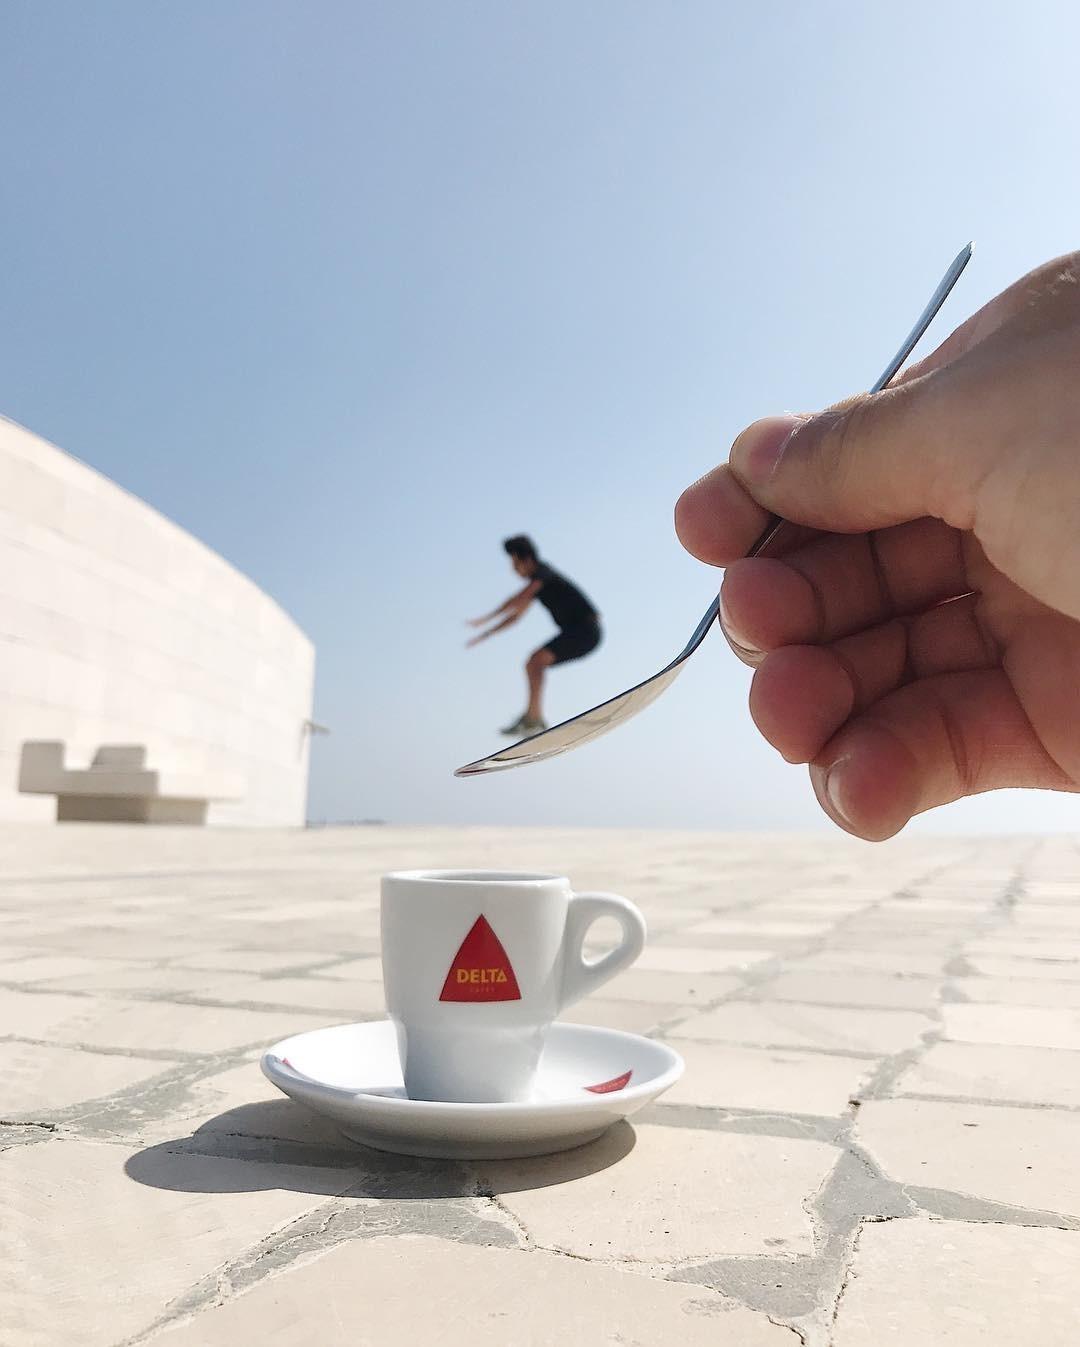 «Кофе объединяет людей». Автор Тиаго Силва